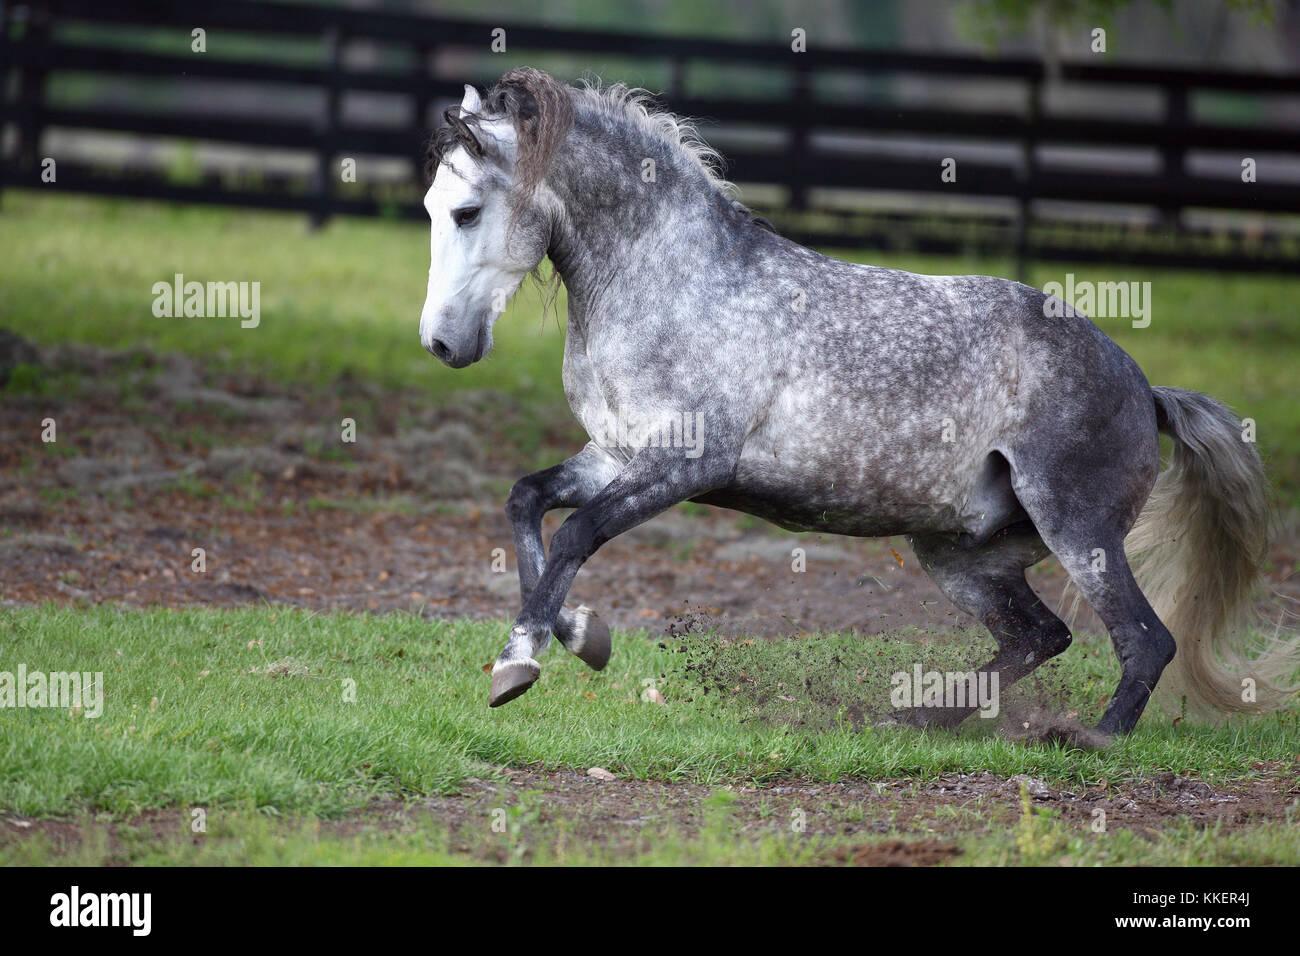 Lusitano Stallion Running Free In Paddock - Stock Image